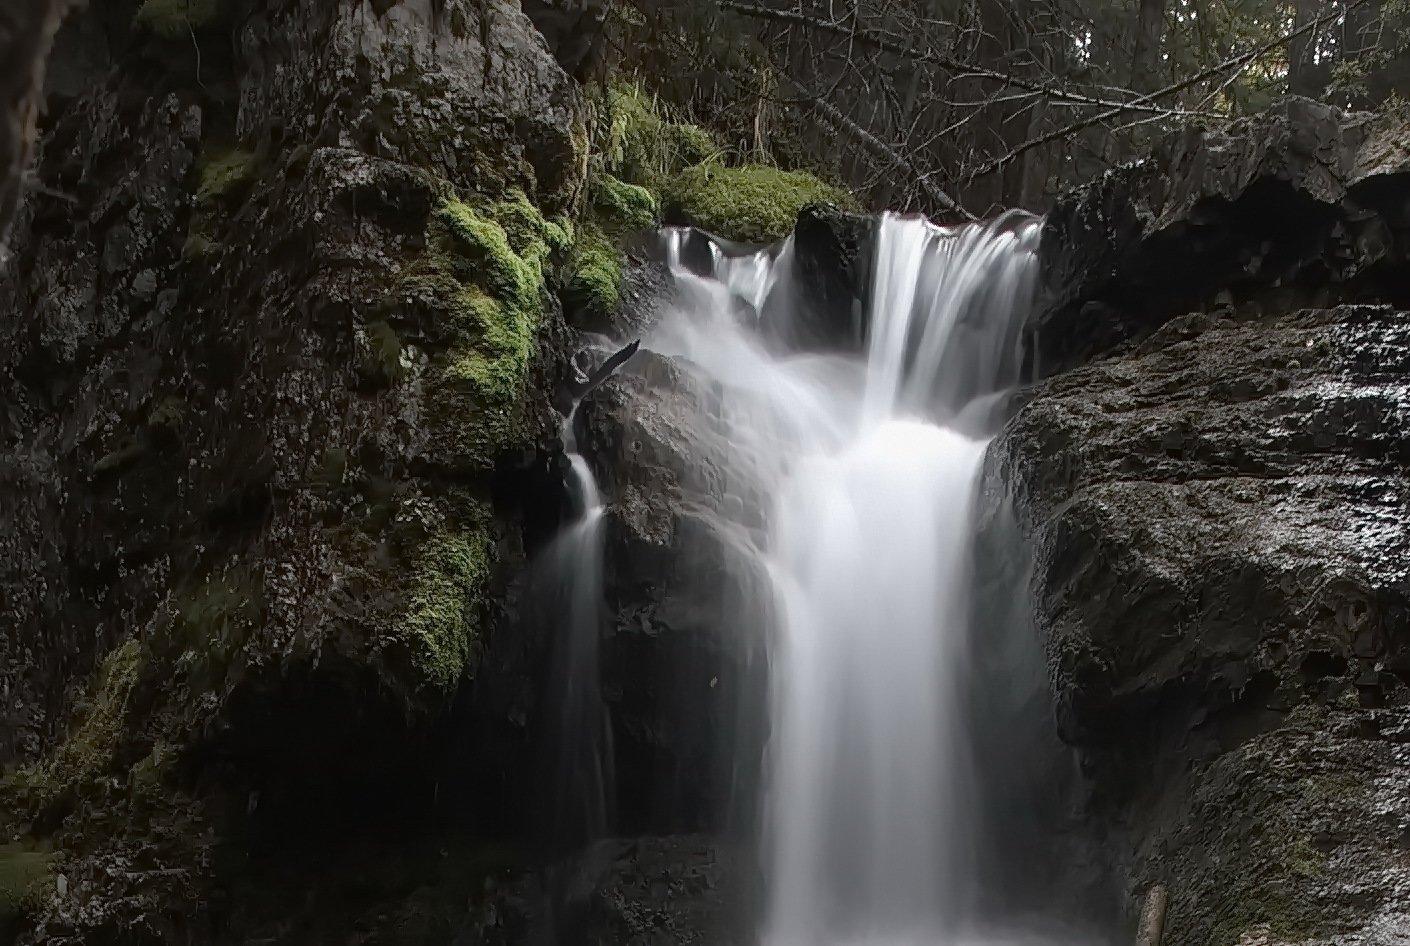 mossy water falls